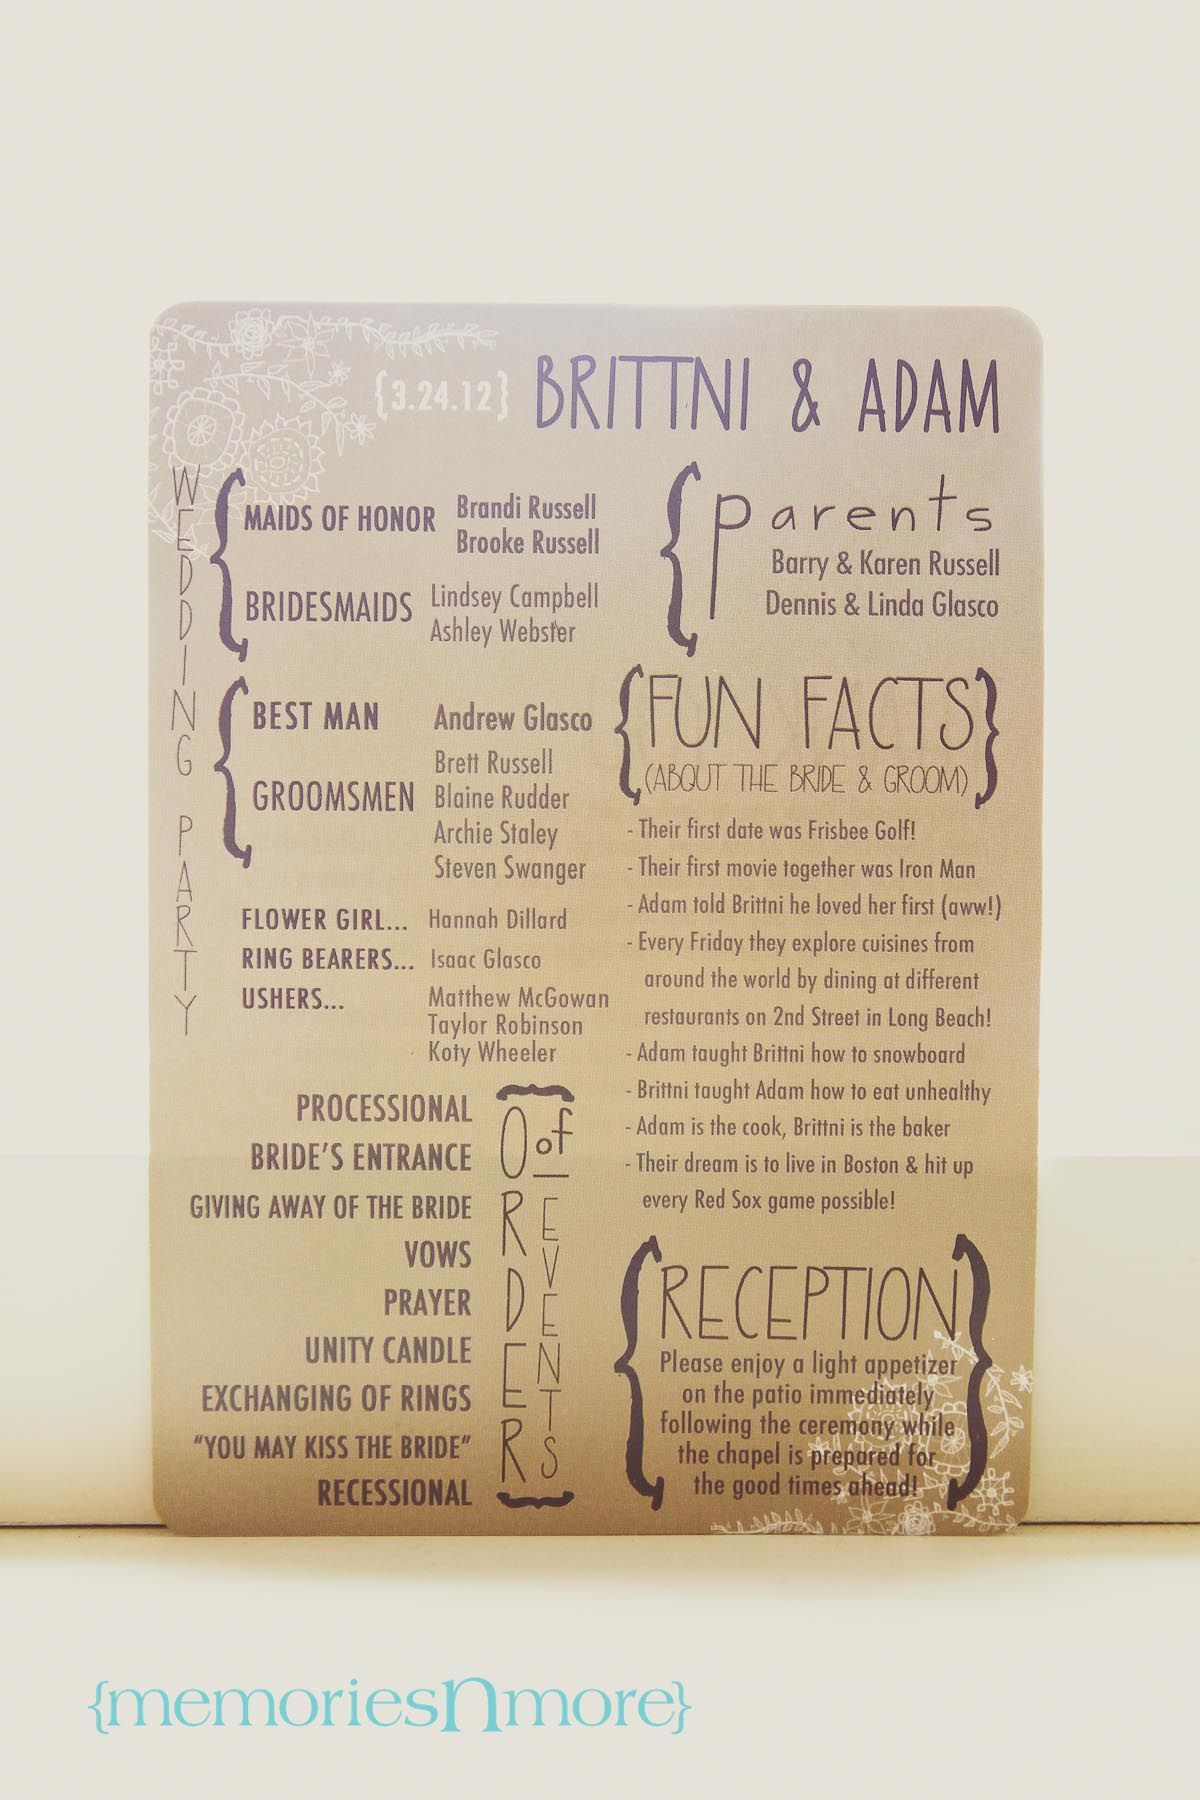 Cute wedding program, love the Fun Facts! Great idea